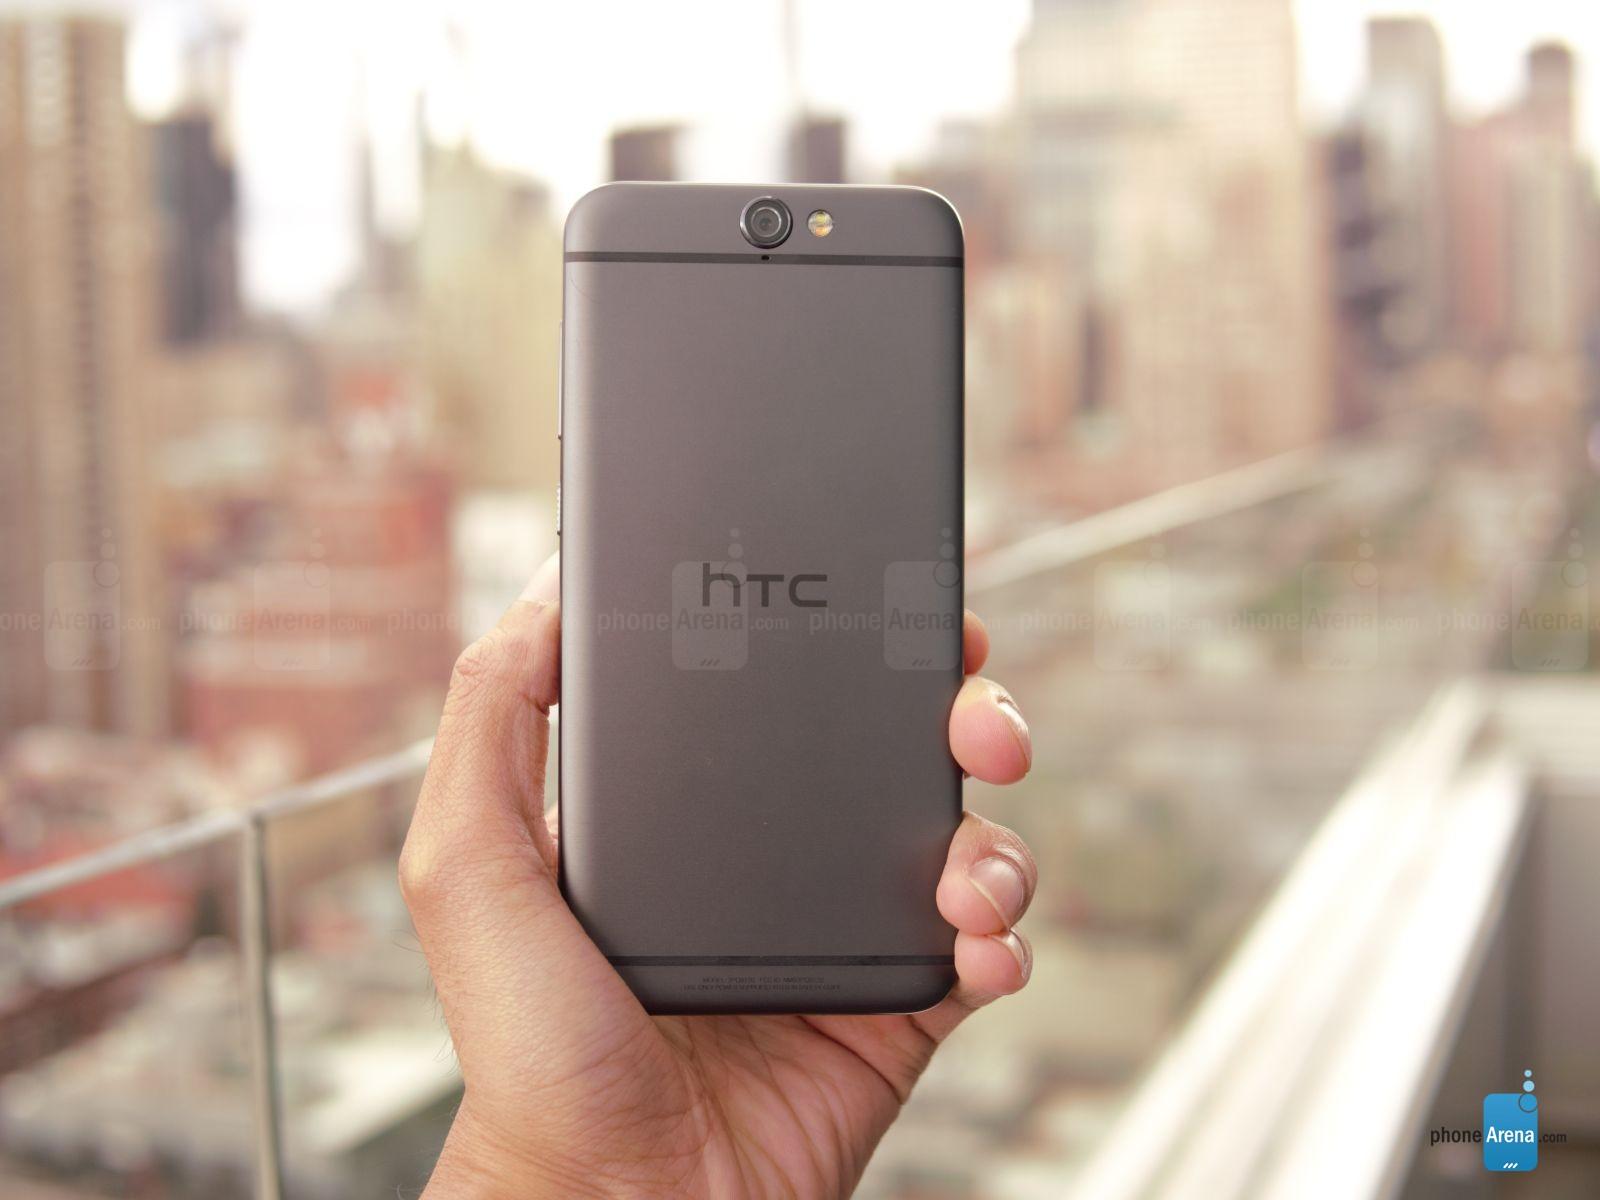 اچ تی سی وان ای ۹ «HTC One A9»